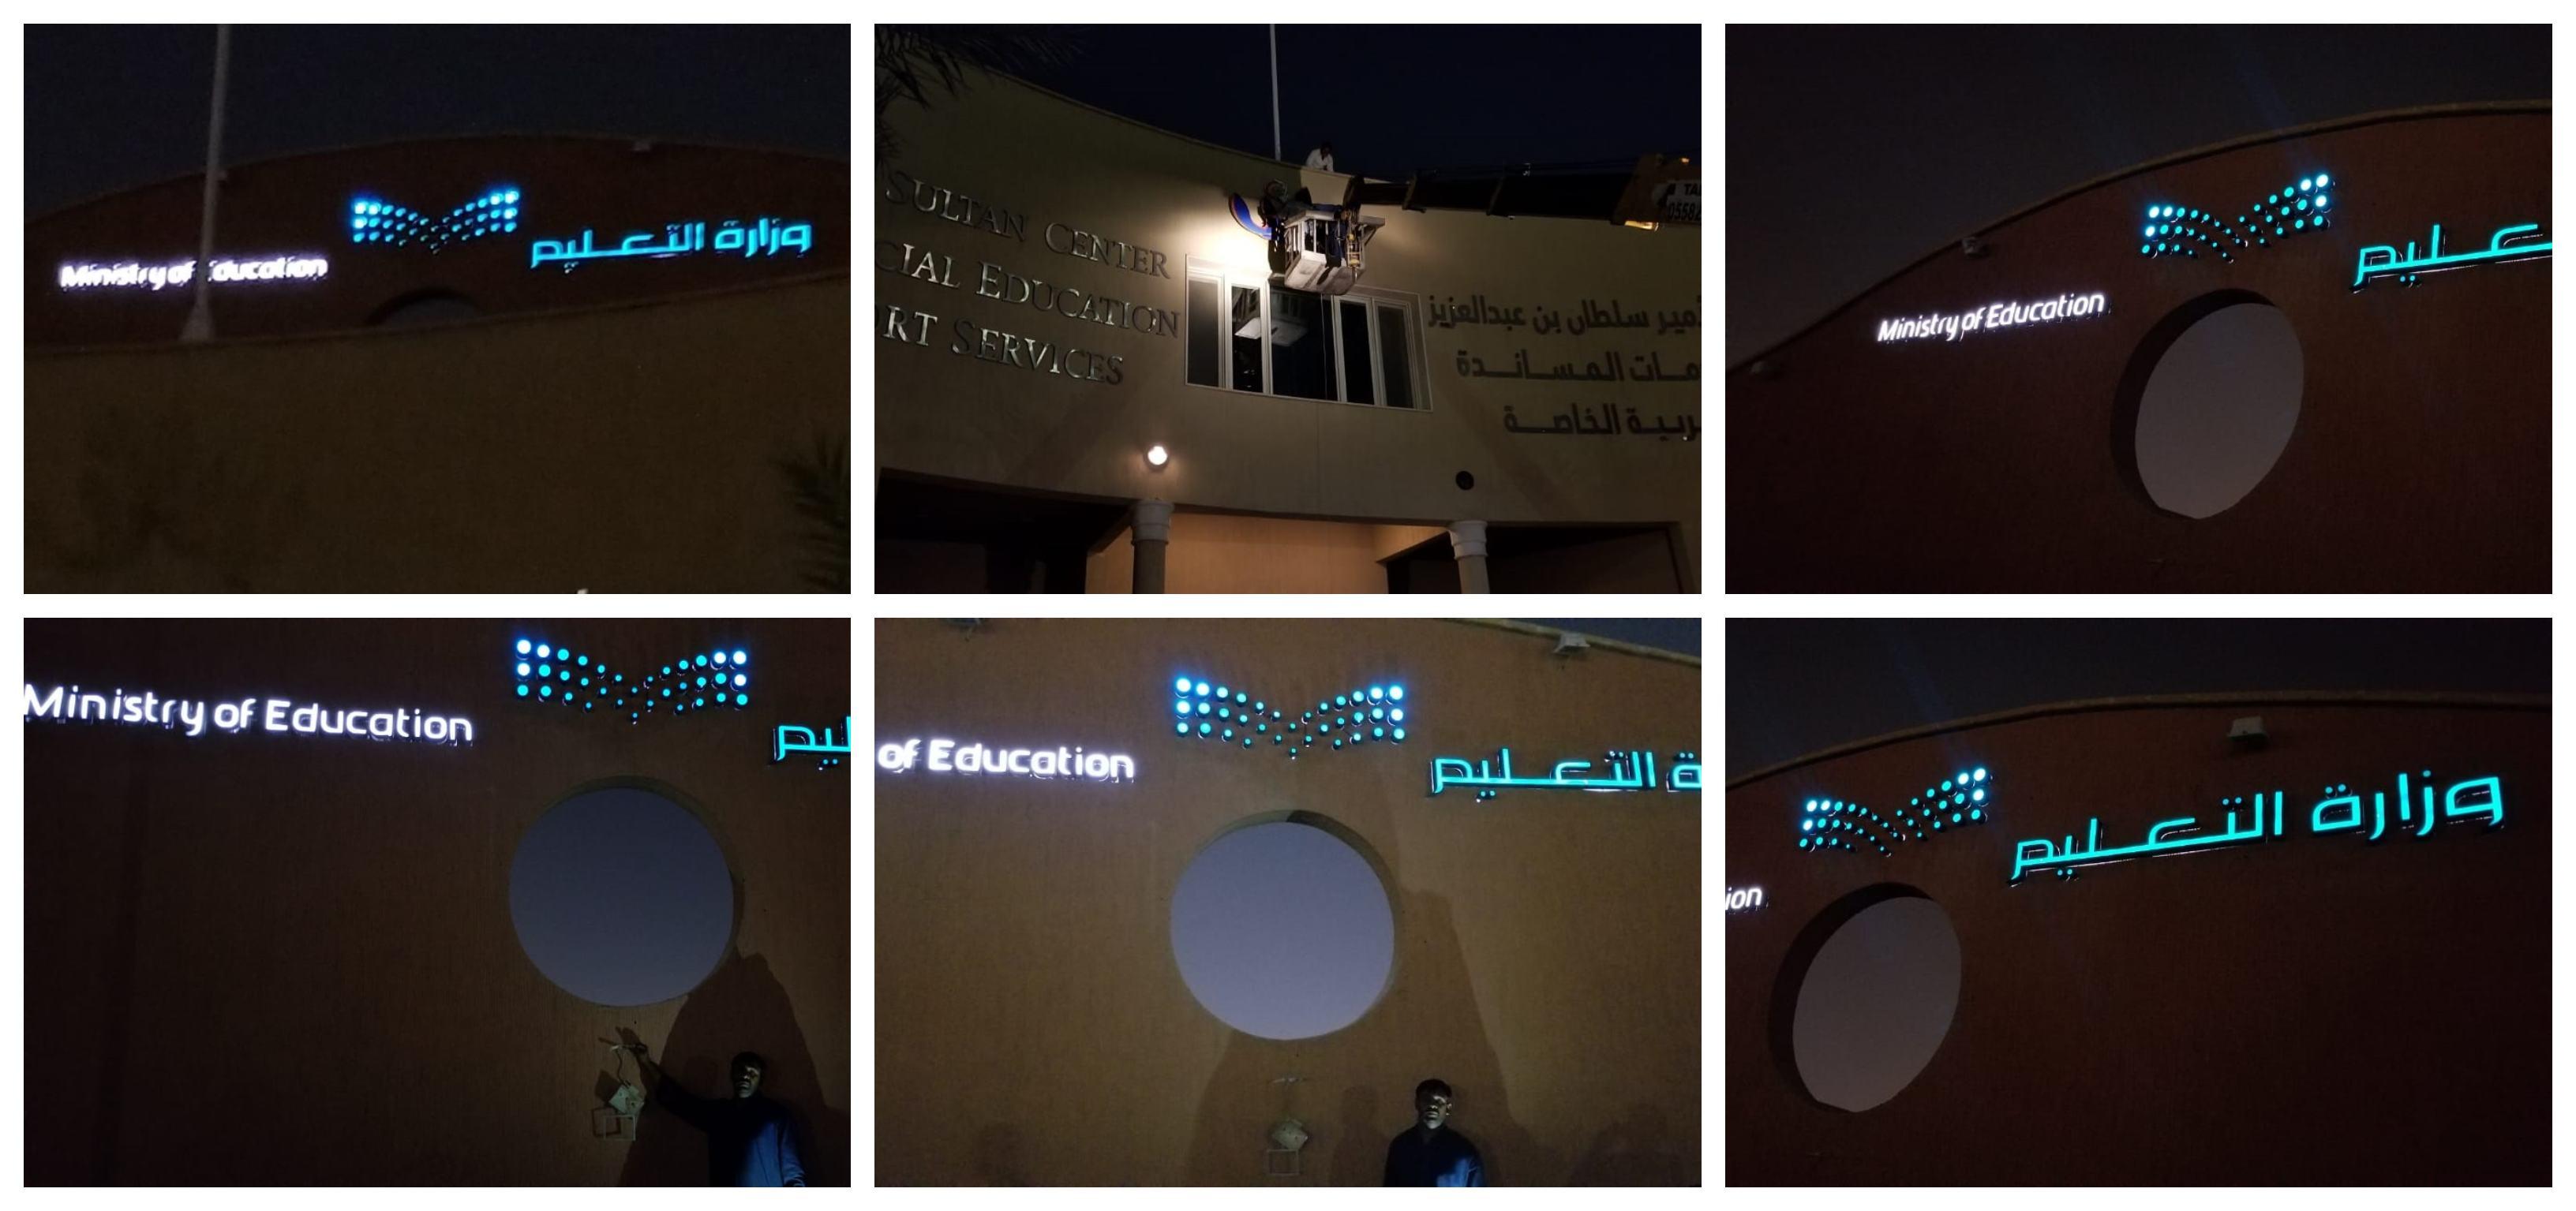 ministry of education.jpg